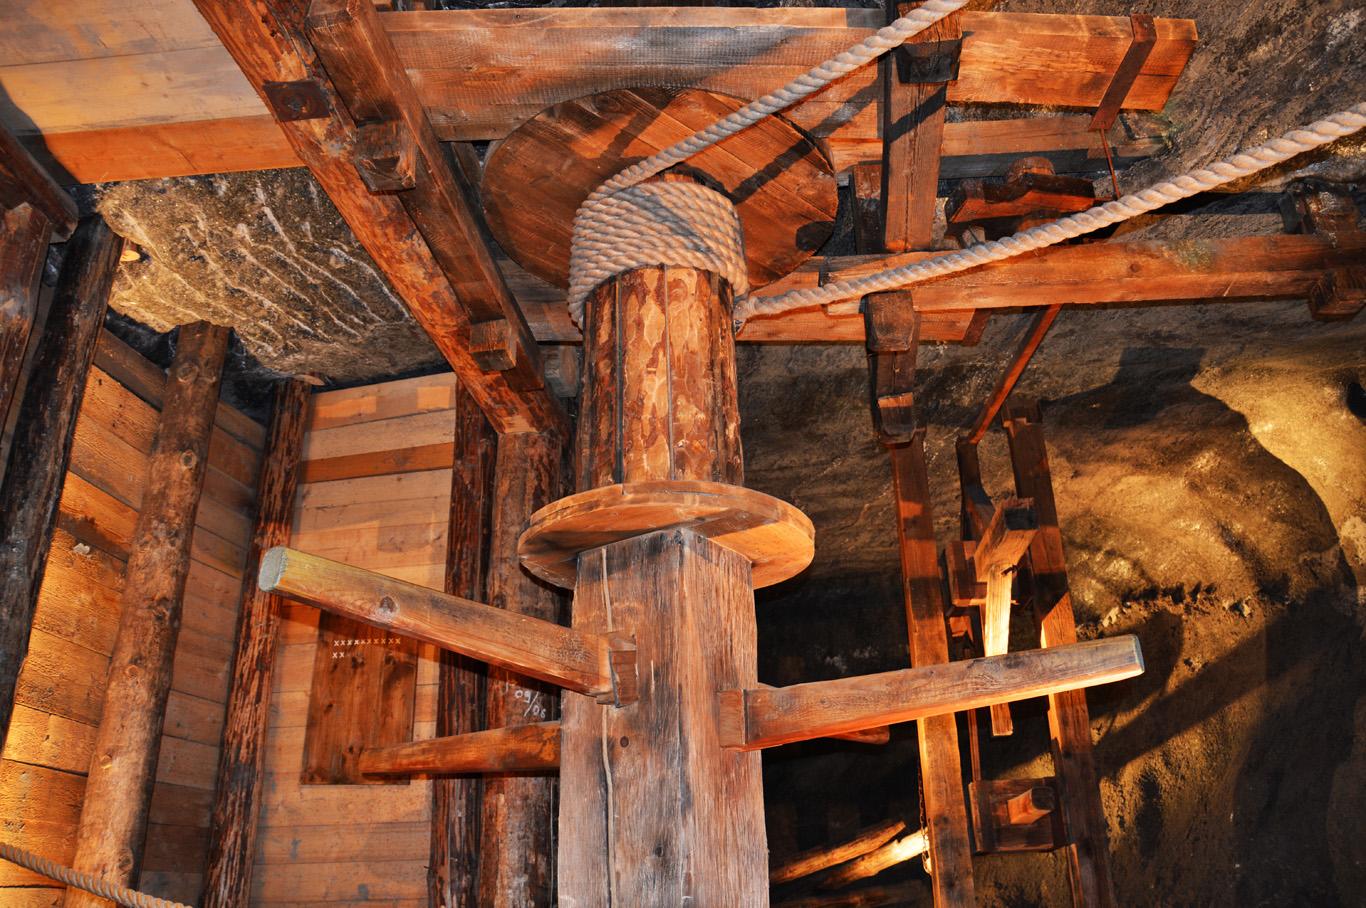 Wooden machinery